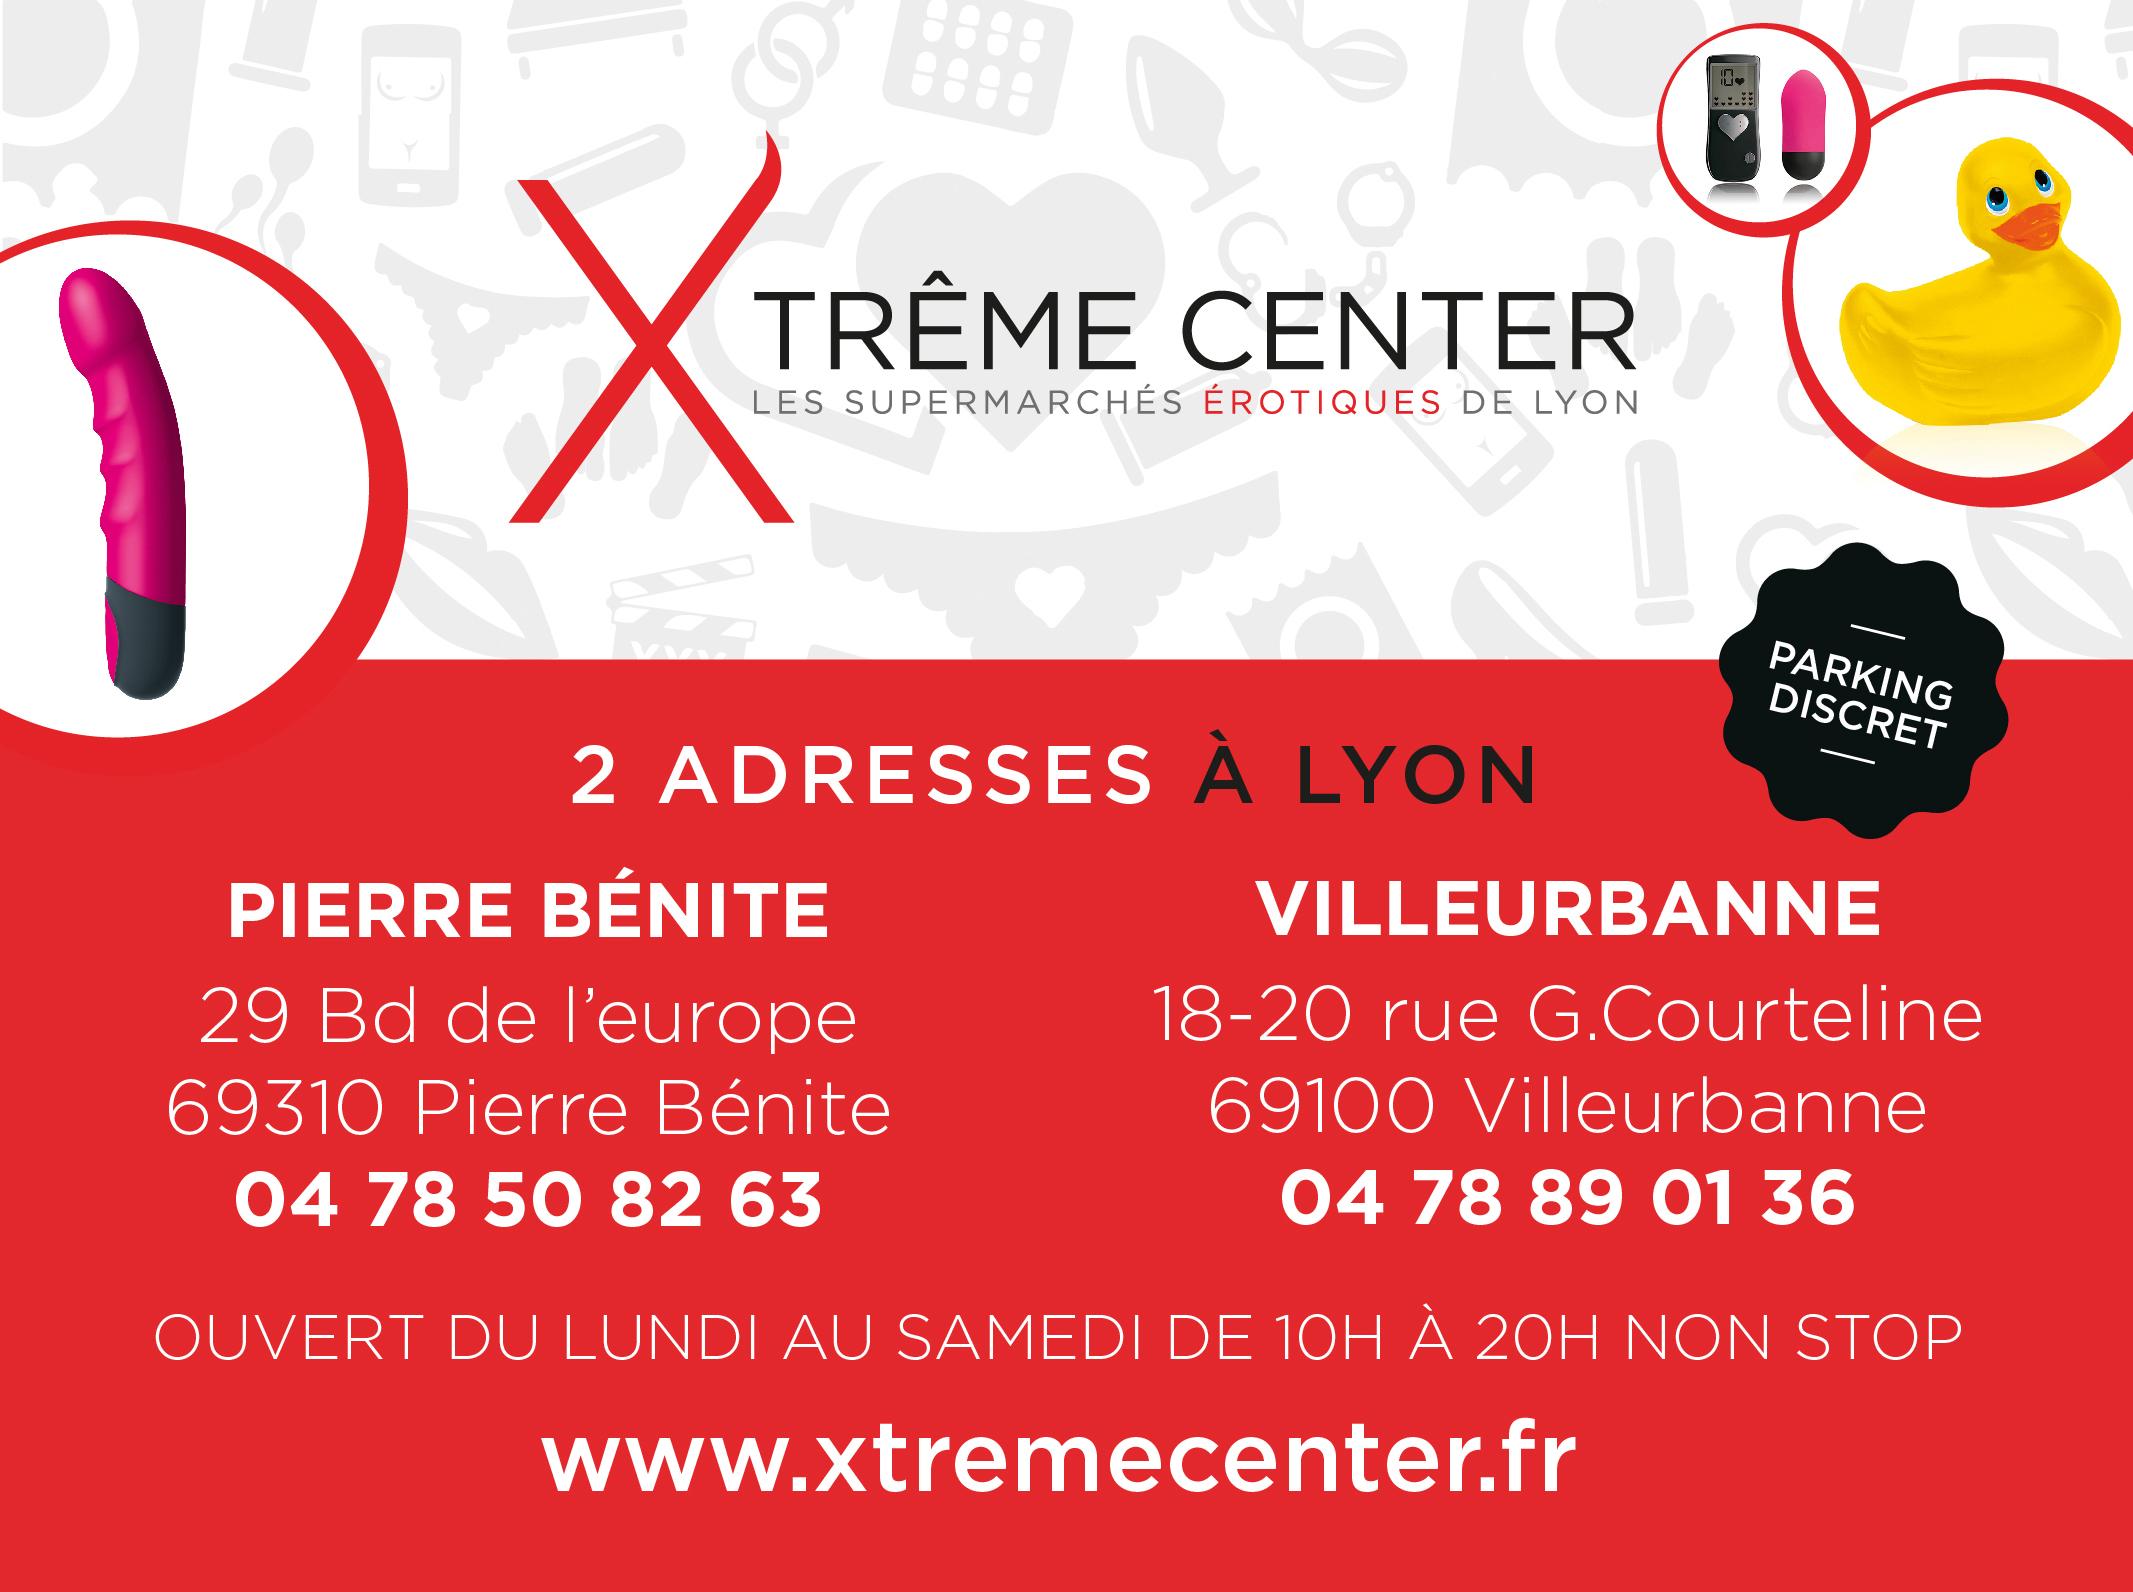 ADRESSE-ECRAN-XTREME-CENTER-02